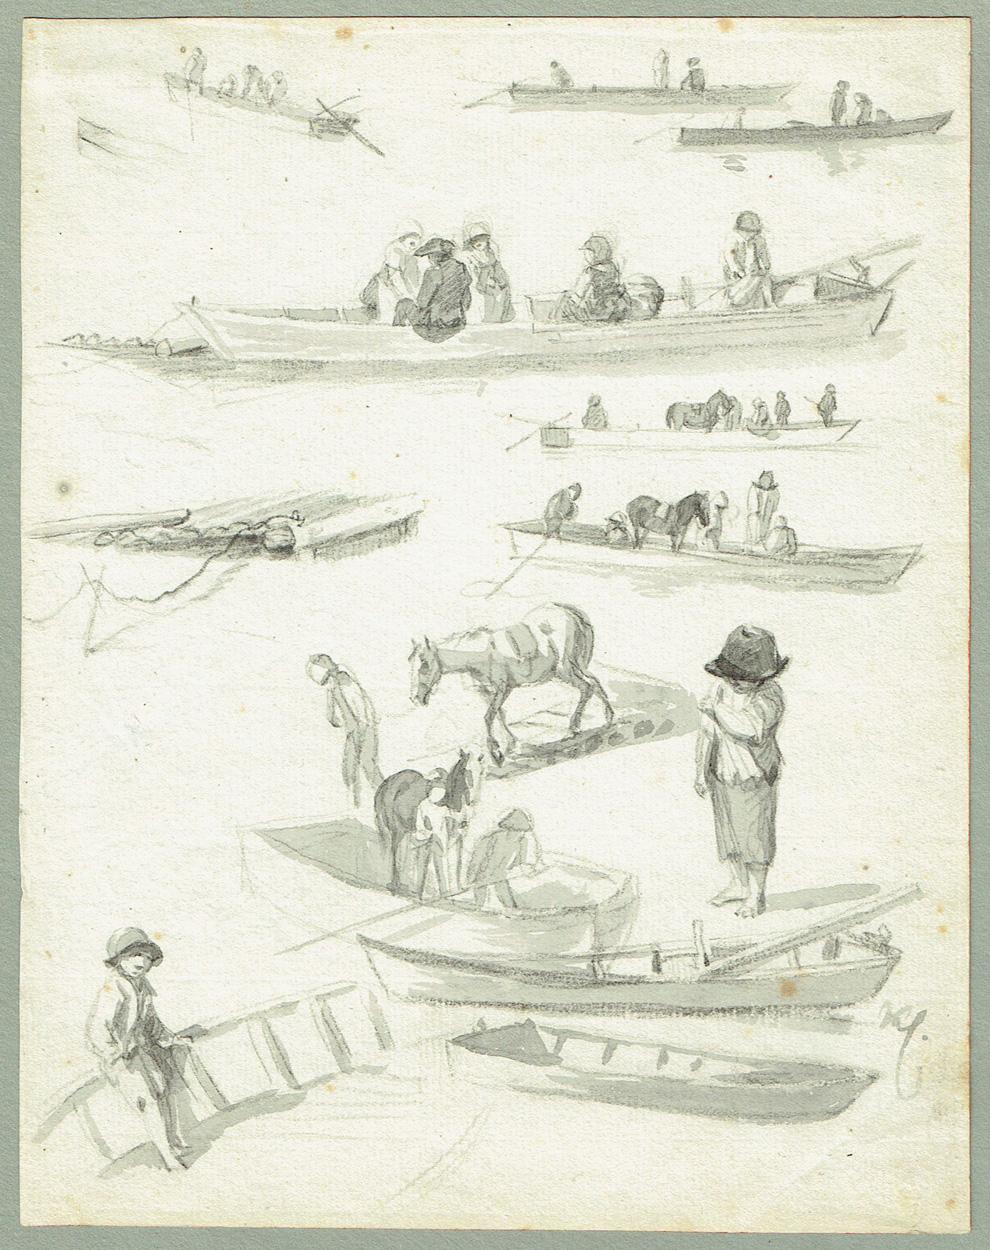 Johann Christian Klengel, Studienblatt mit Booten und Figuren